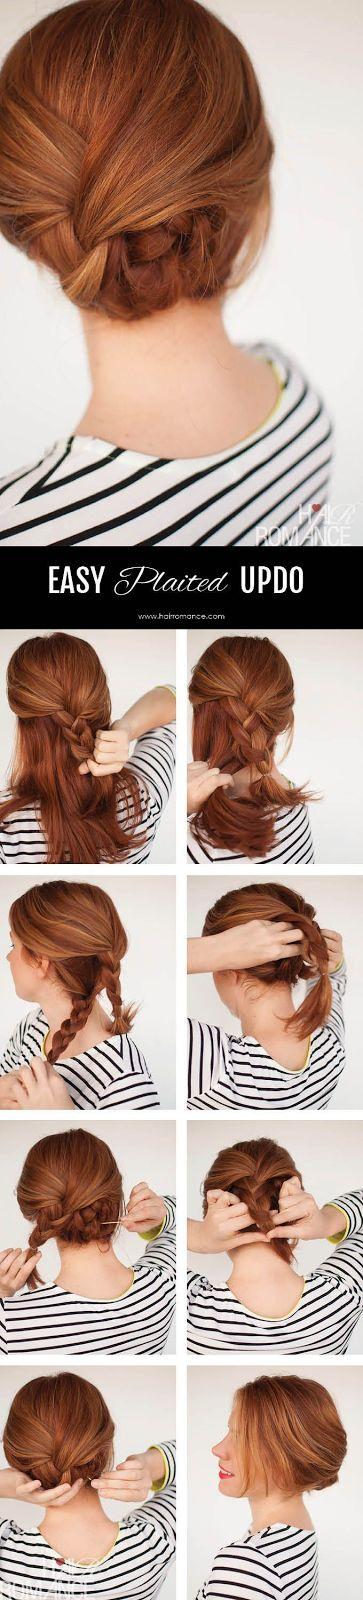 Phenomenal 1000 Ideas About Easy Braided Hairstyles On Pinterest Types Of Short Hairstyles Gunalazisus